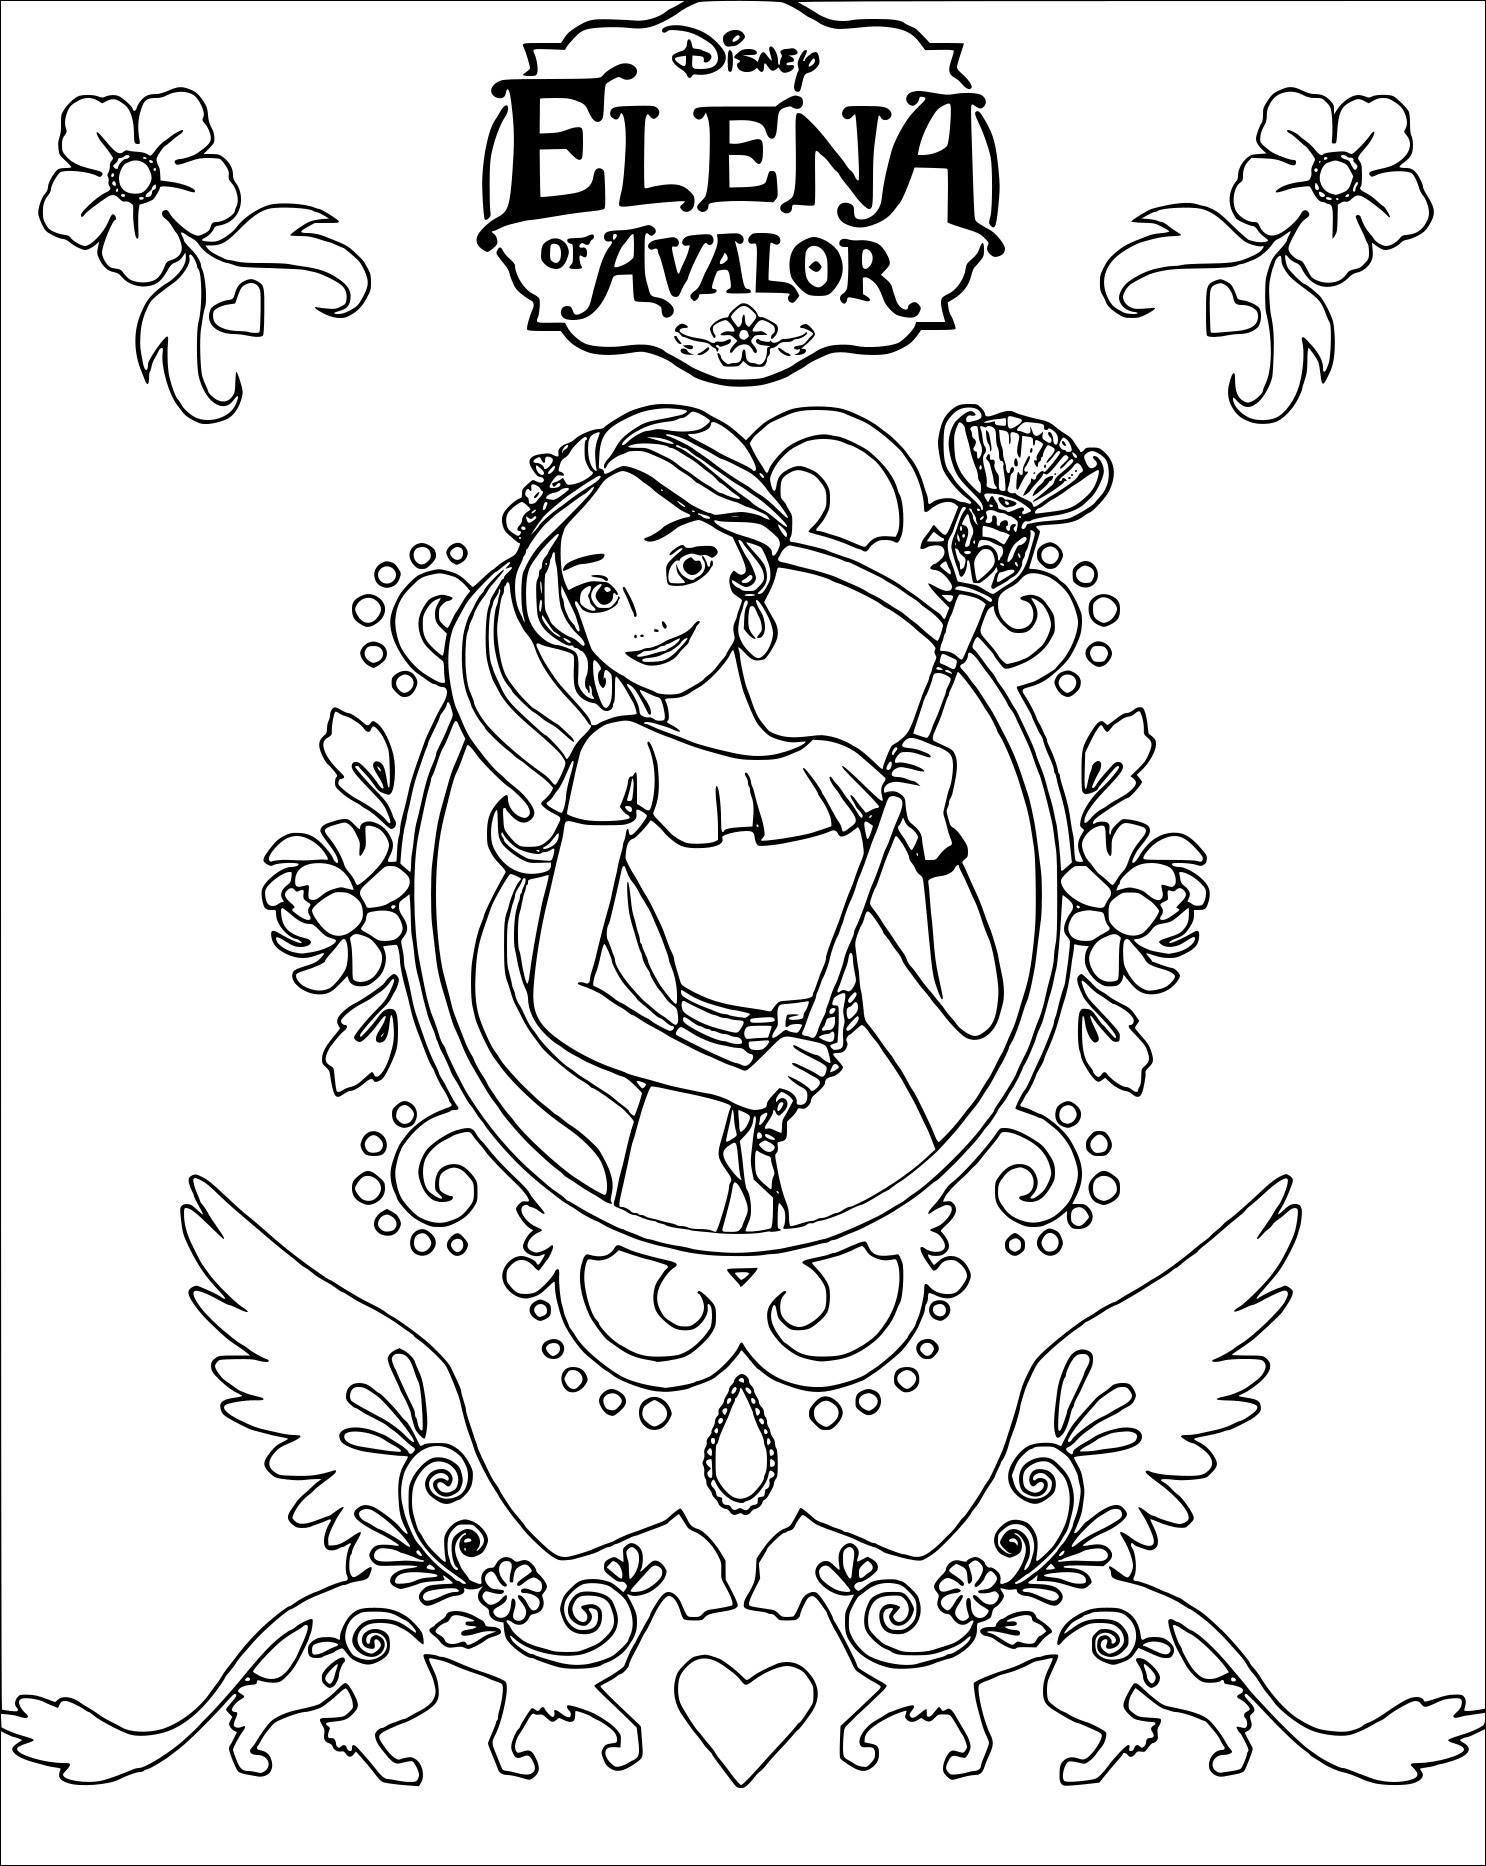 Coloriage Elena Davalor De Disney à Imprimer Sur Coloriage De Com